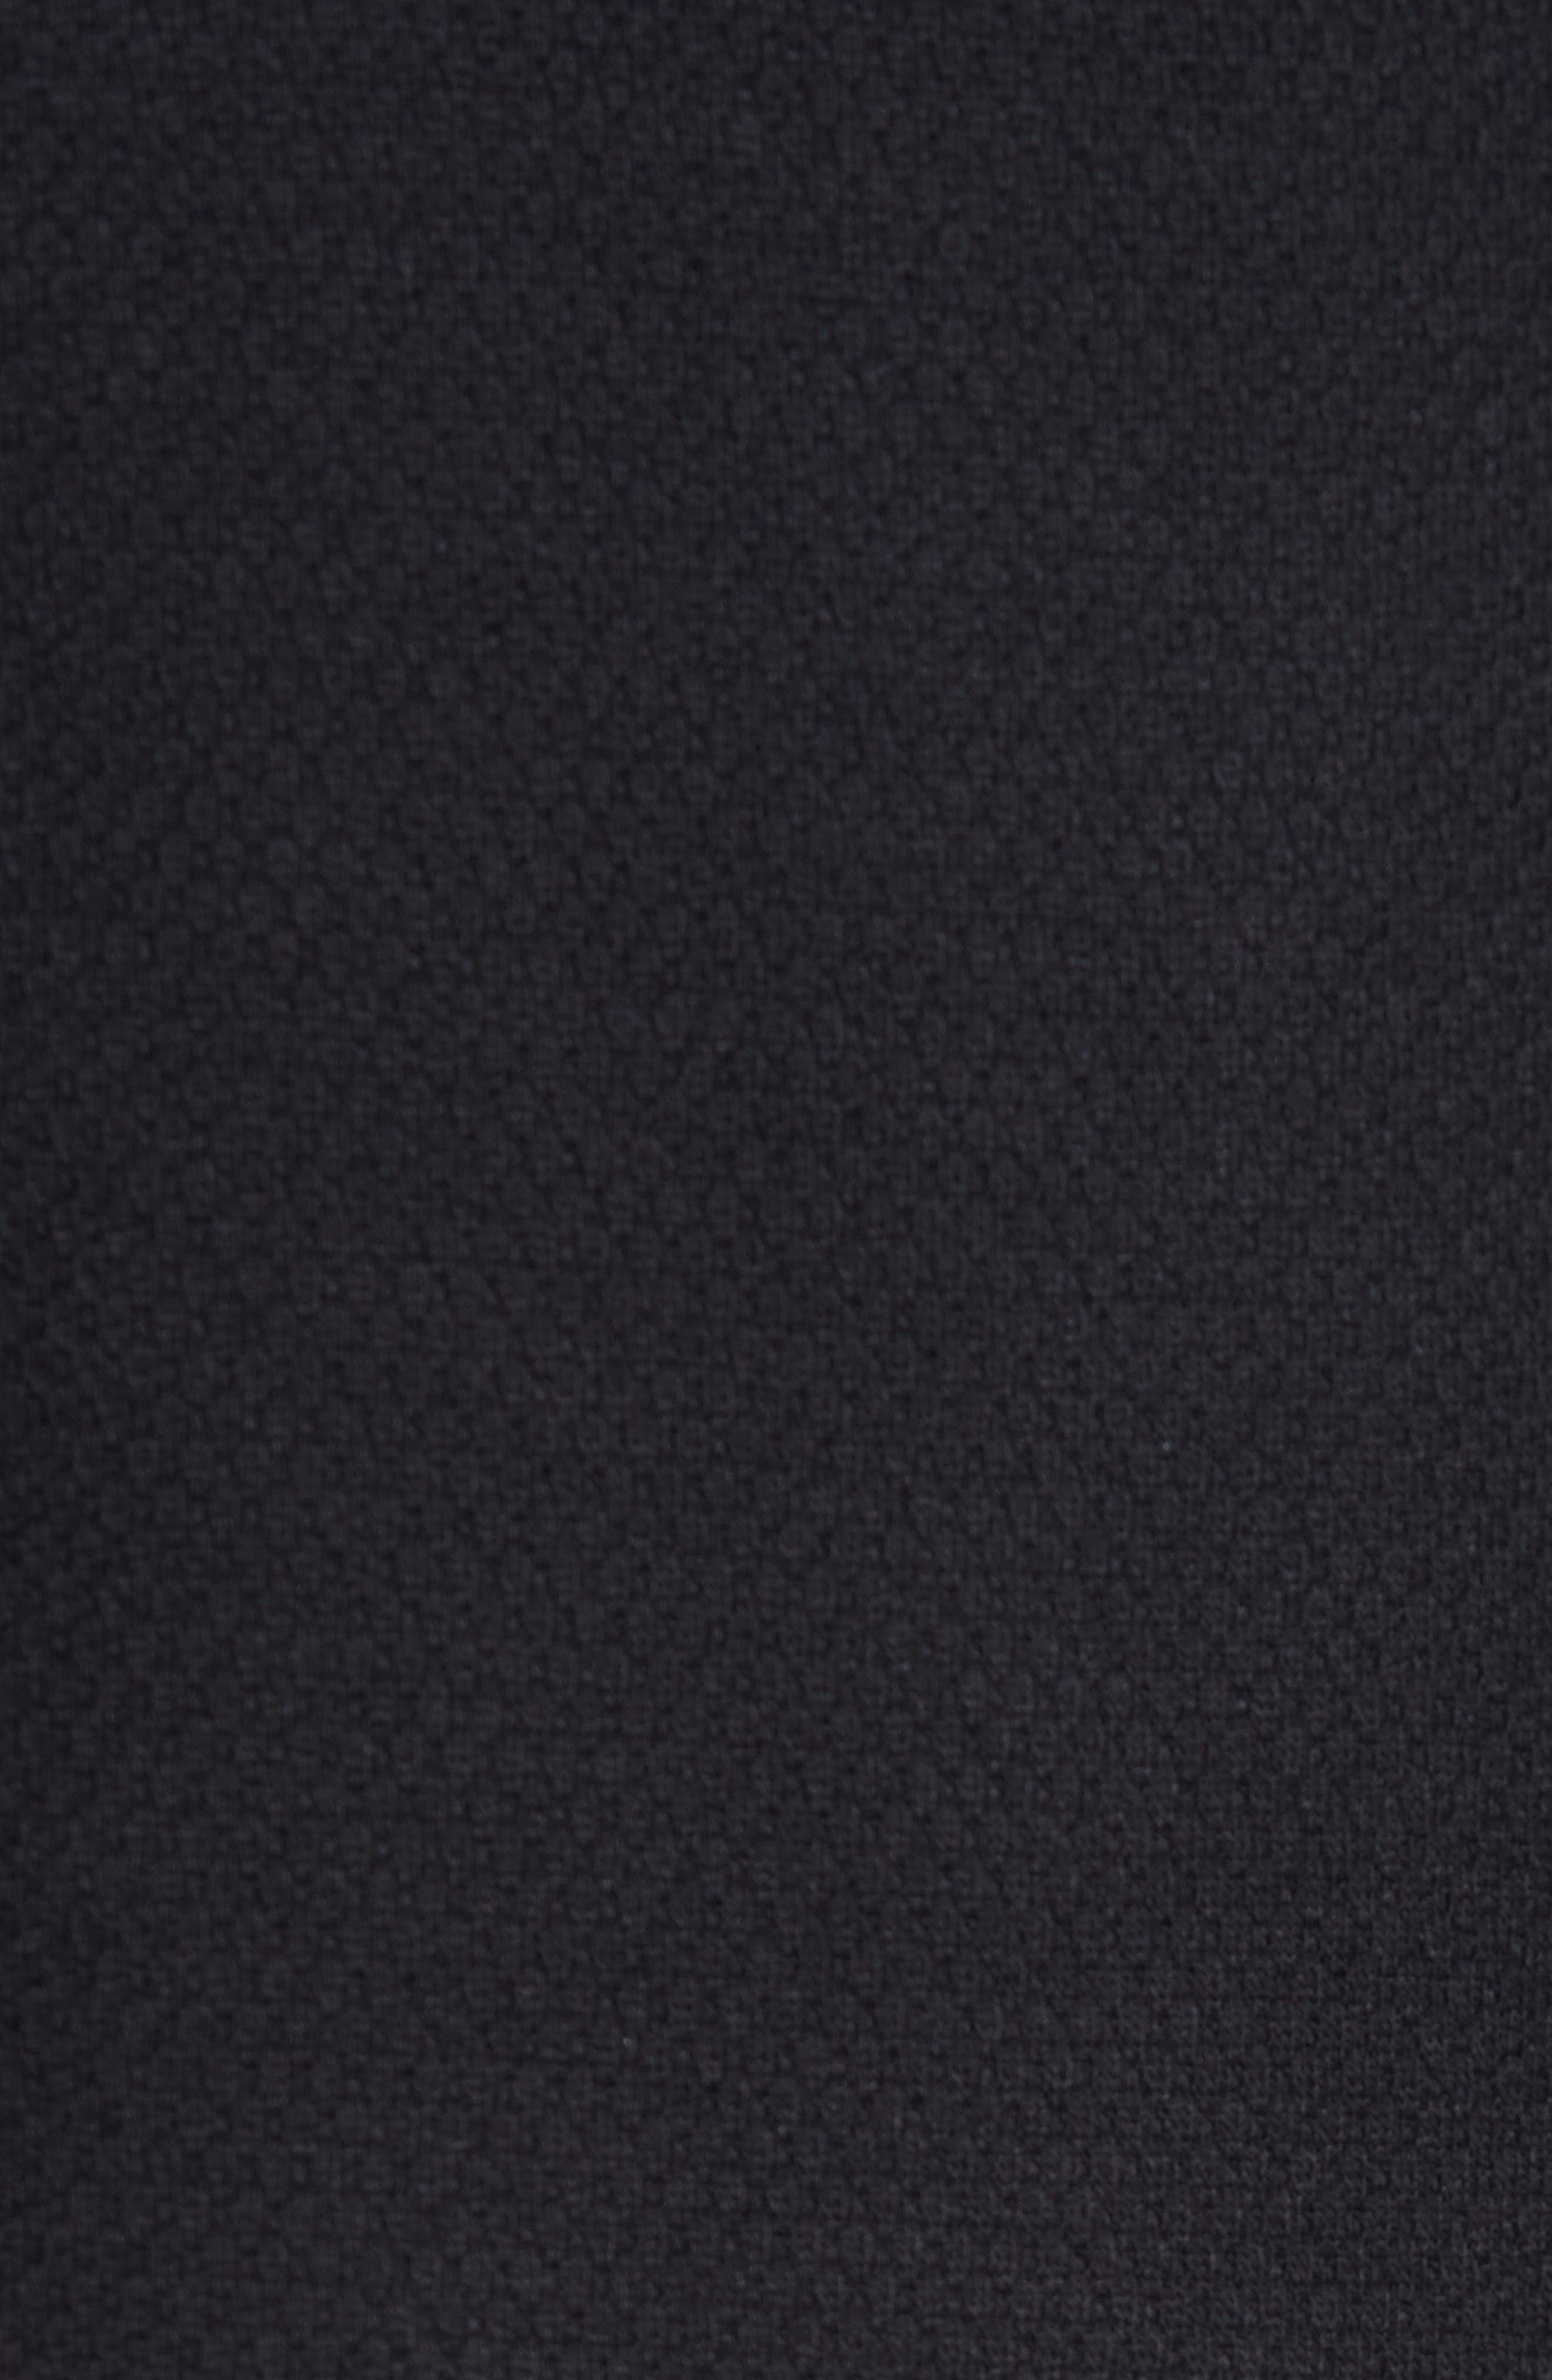 Stripe Trim Sweatshirt,                             Alternate thumbnail 5, color,                             001